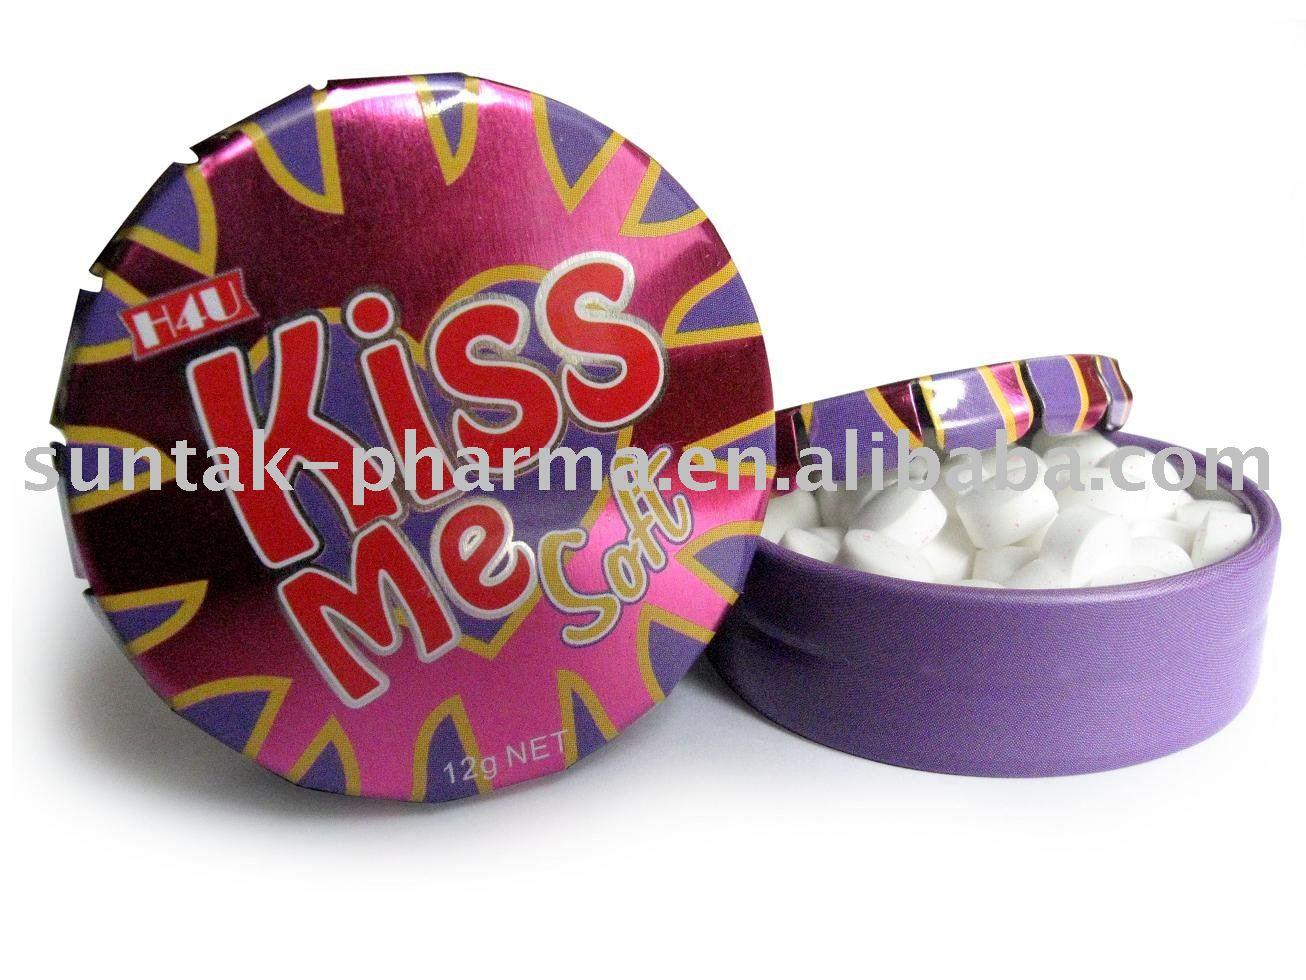 KISS Dextrose Mint Candy sweet